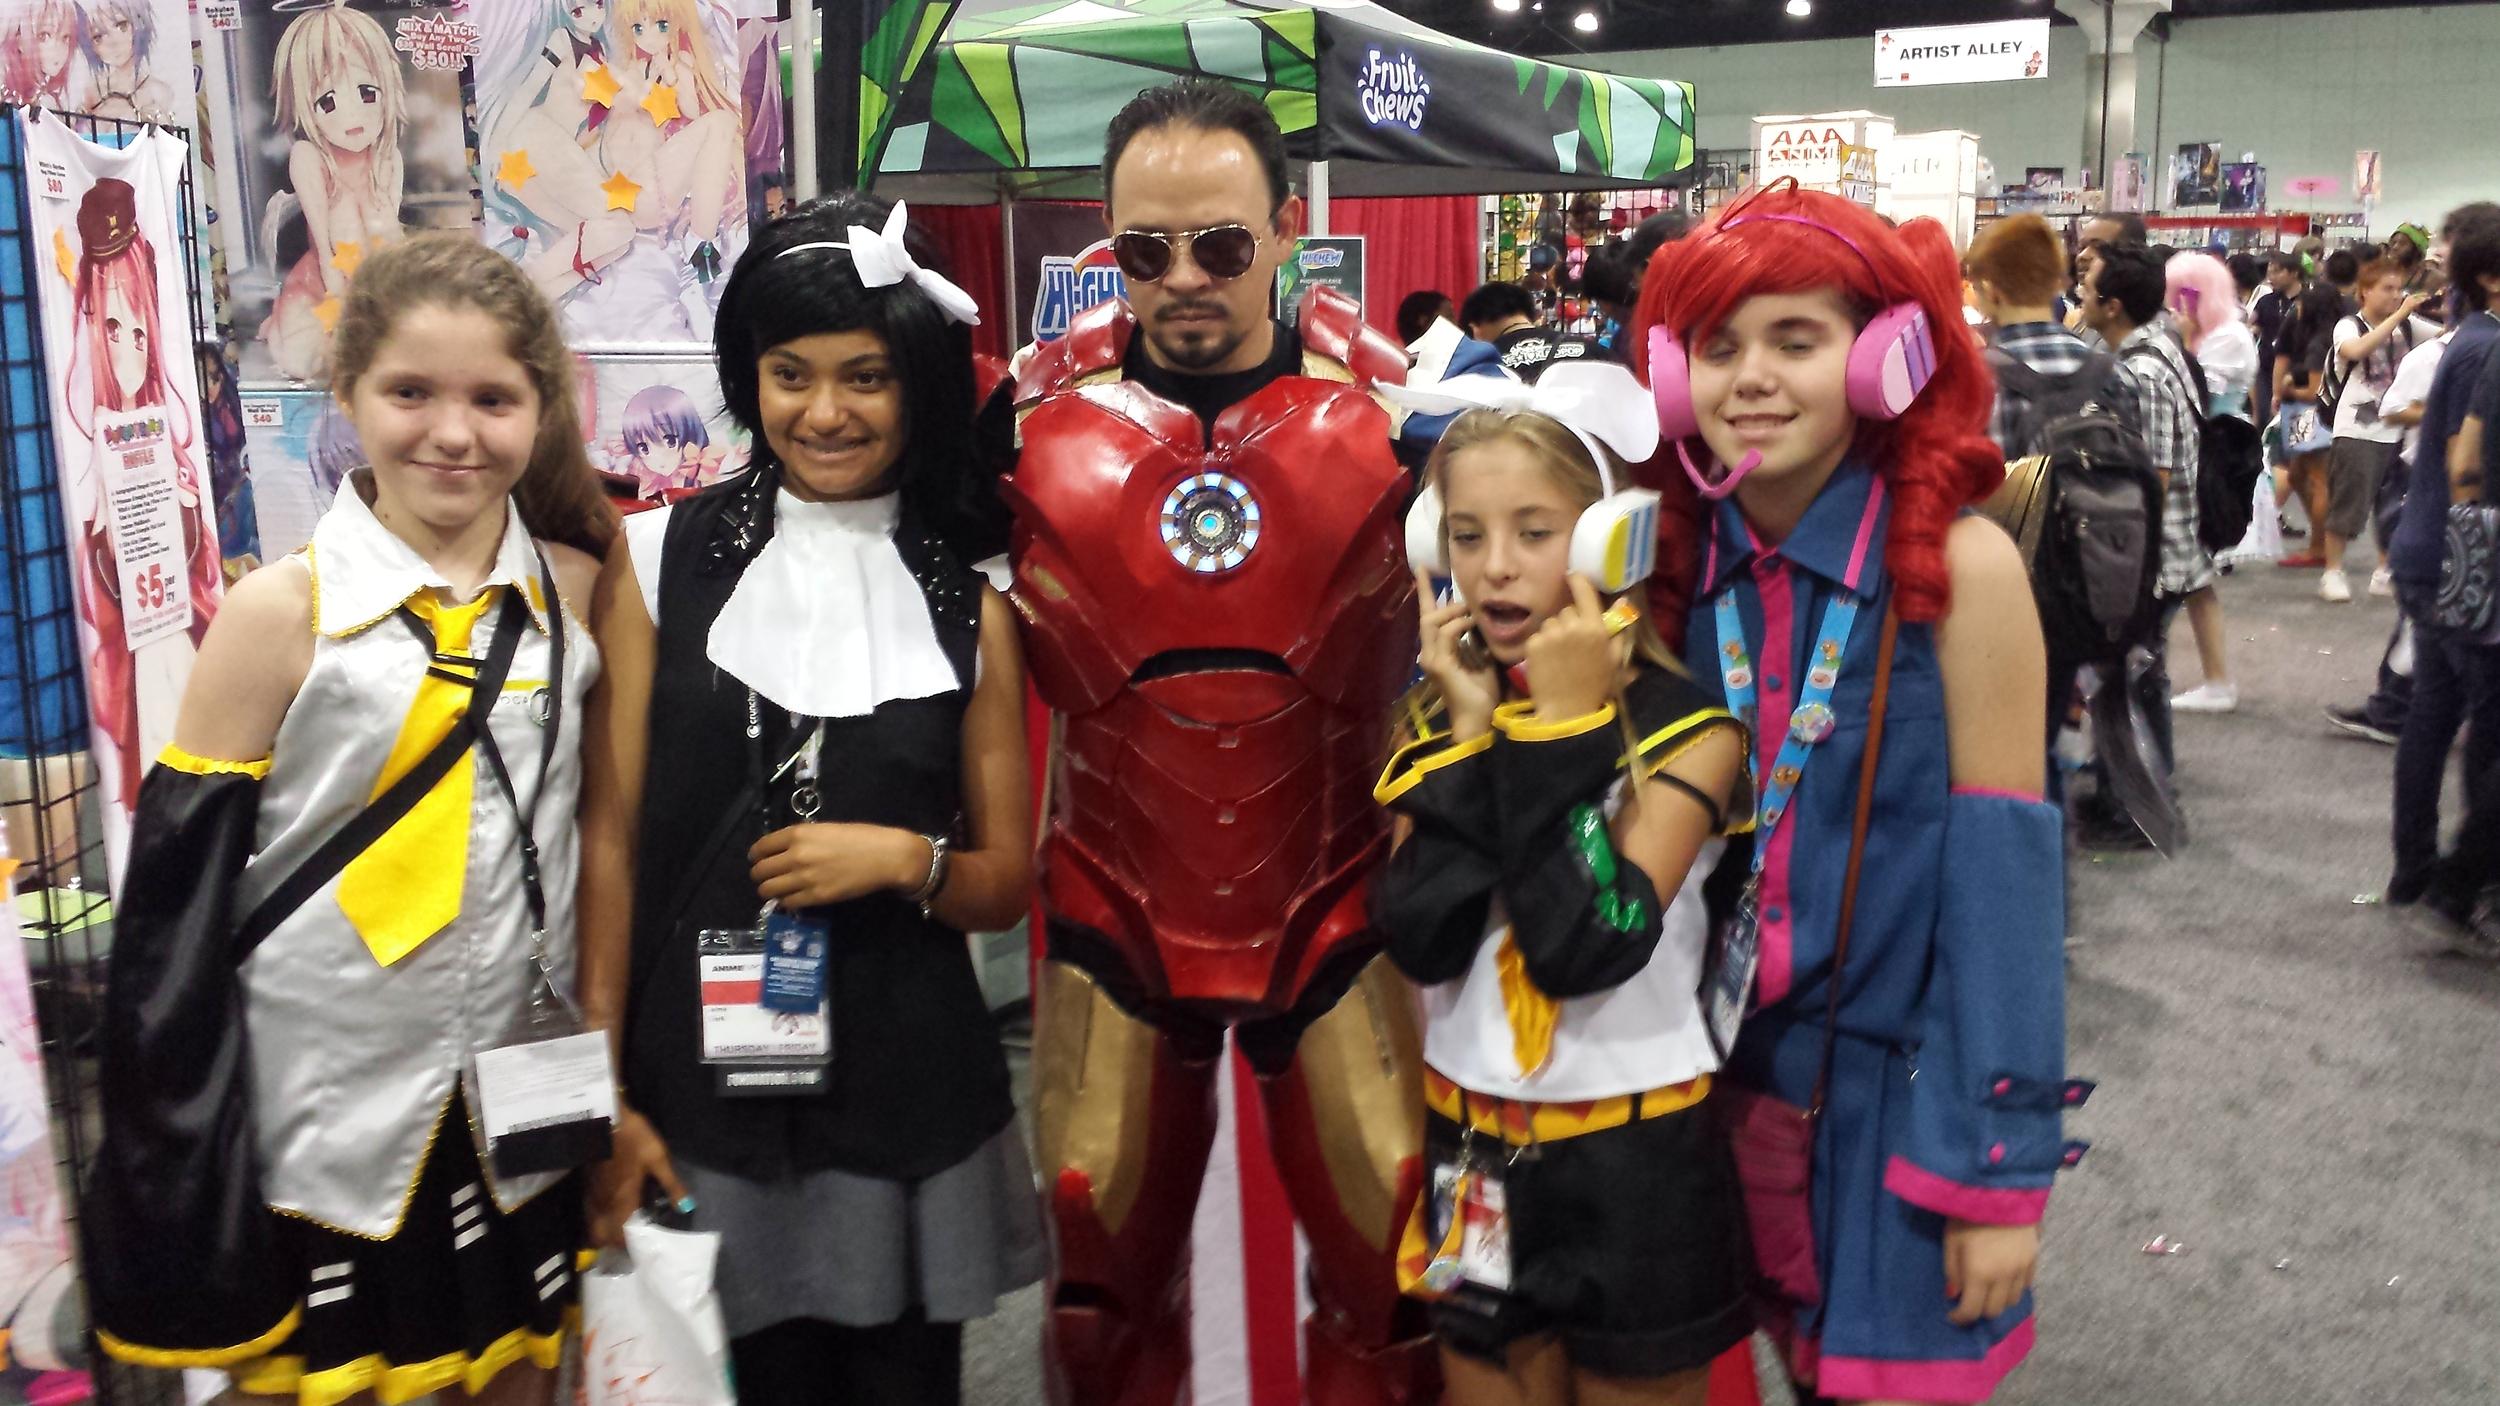 AnimeExpo 2013 - Iron Man